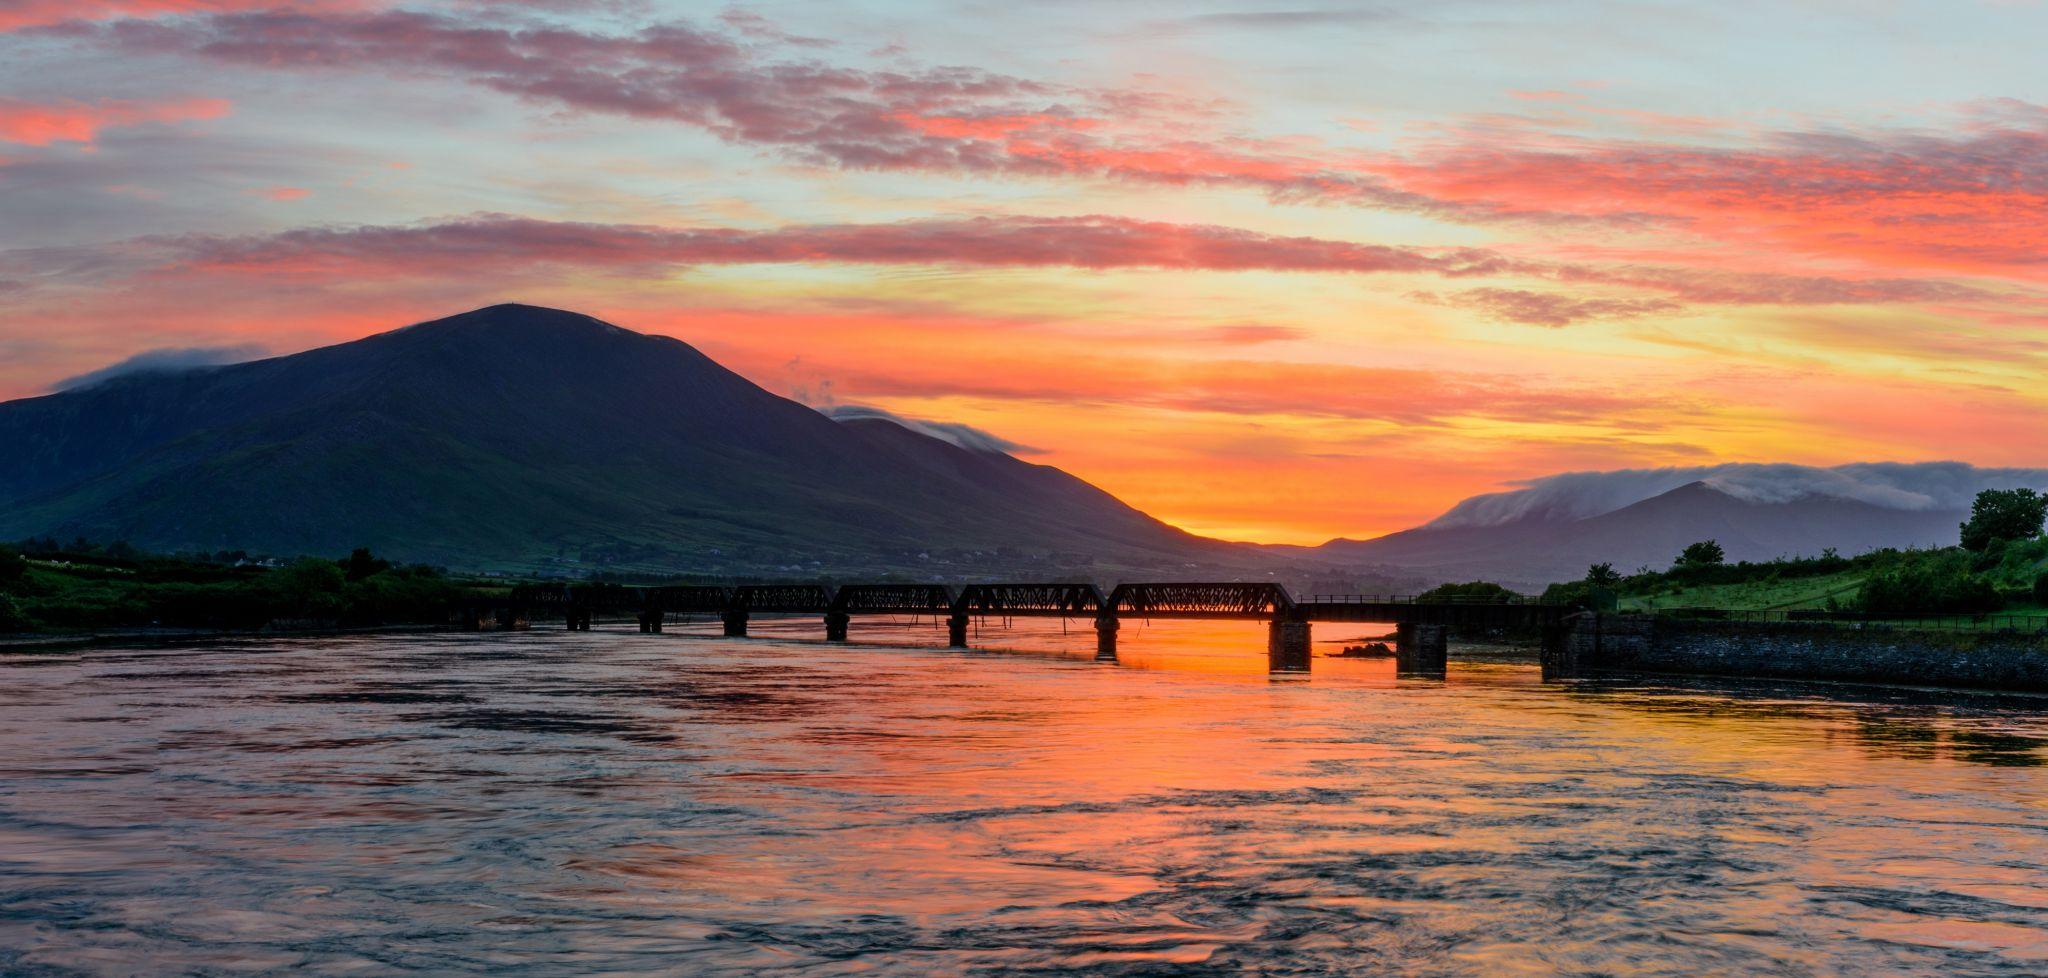 Cahersiveen Railway Bridge, Ireland